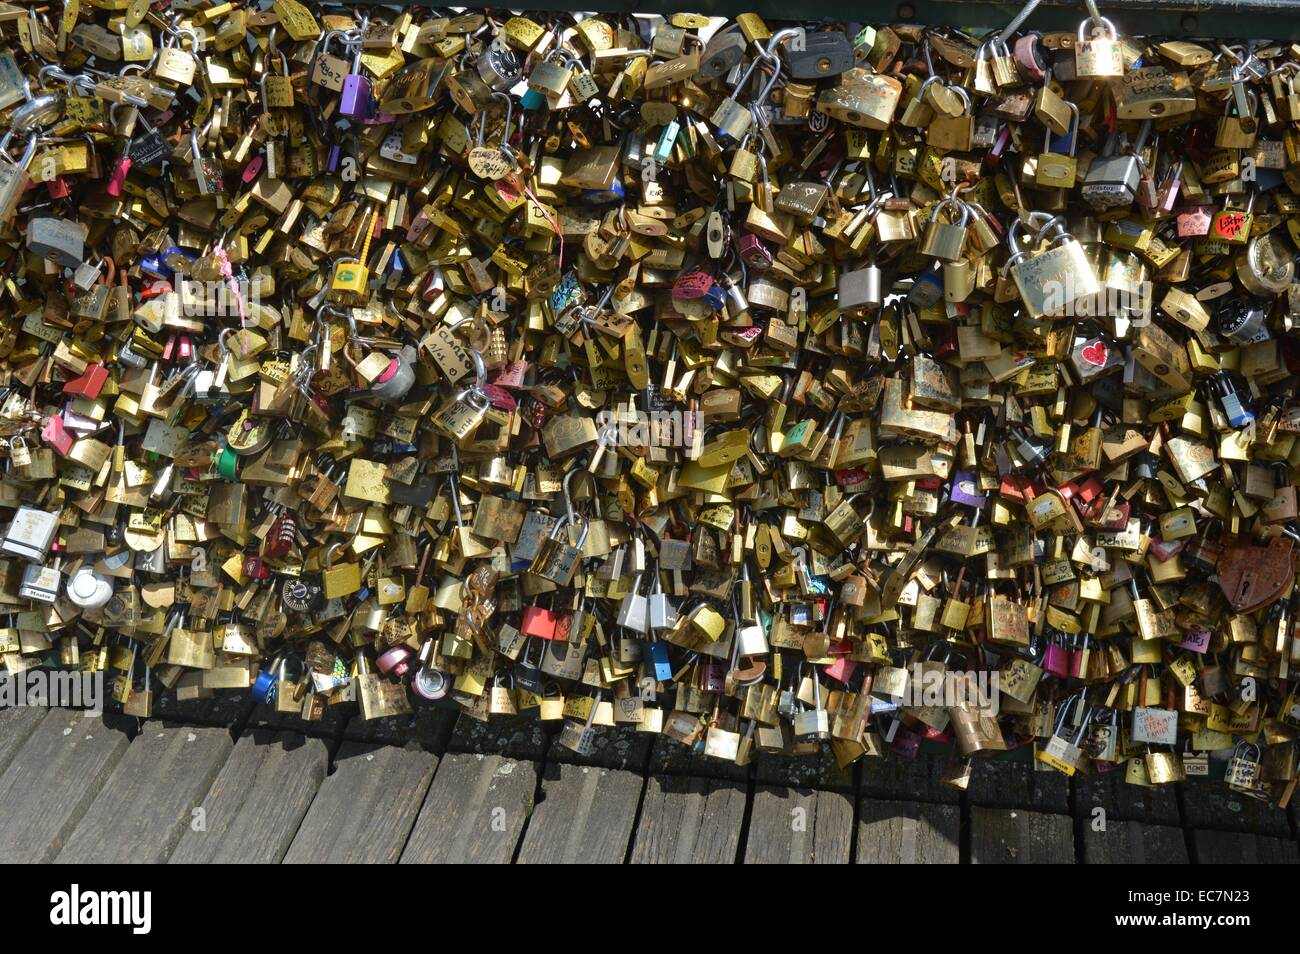 The Pont des Arts bridge in Paris with attached padlocks (love locks) - Stock Image